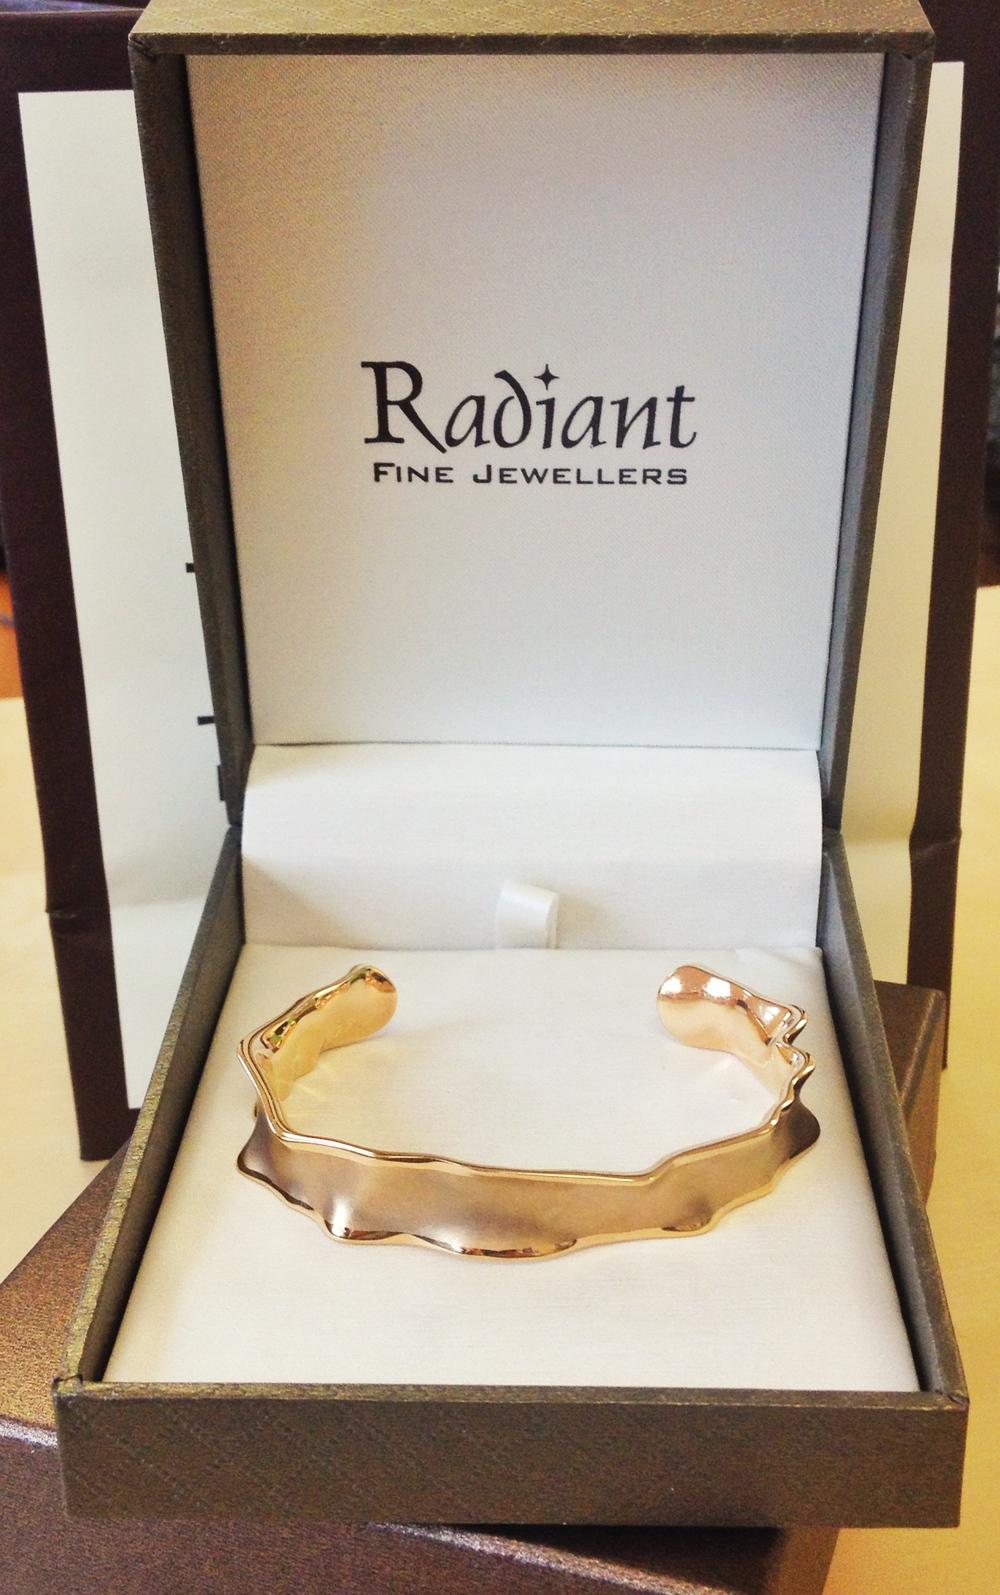 www.   radiantfinejewellers   .com   Radiant Fine Jewellers Charles Garnier silver/gold plated bangle bracelet $315 value